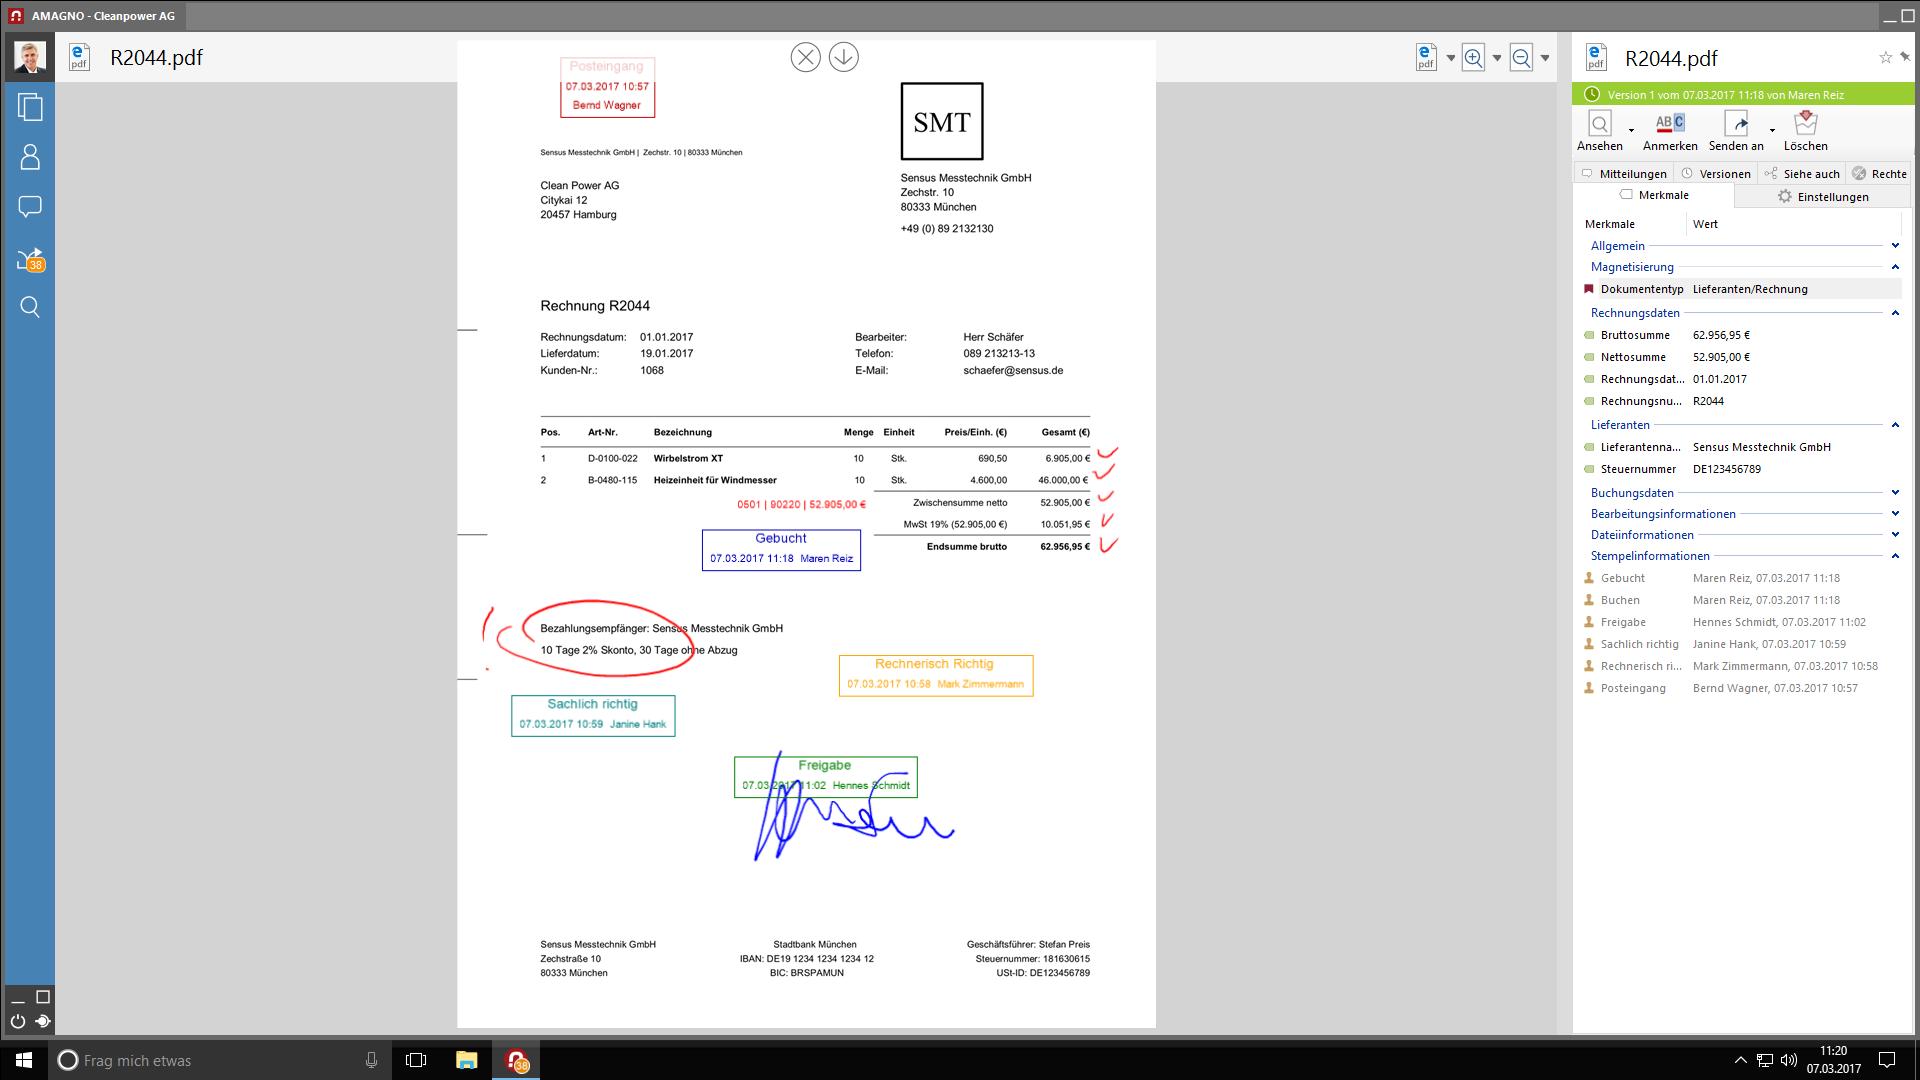 interaktive-dokumente